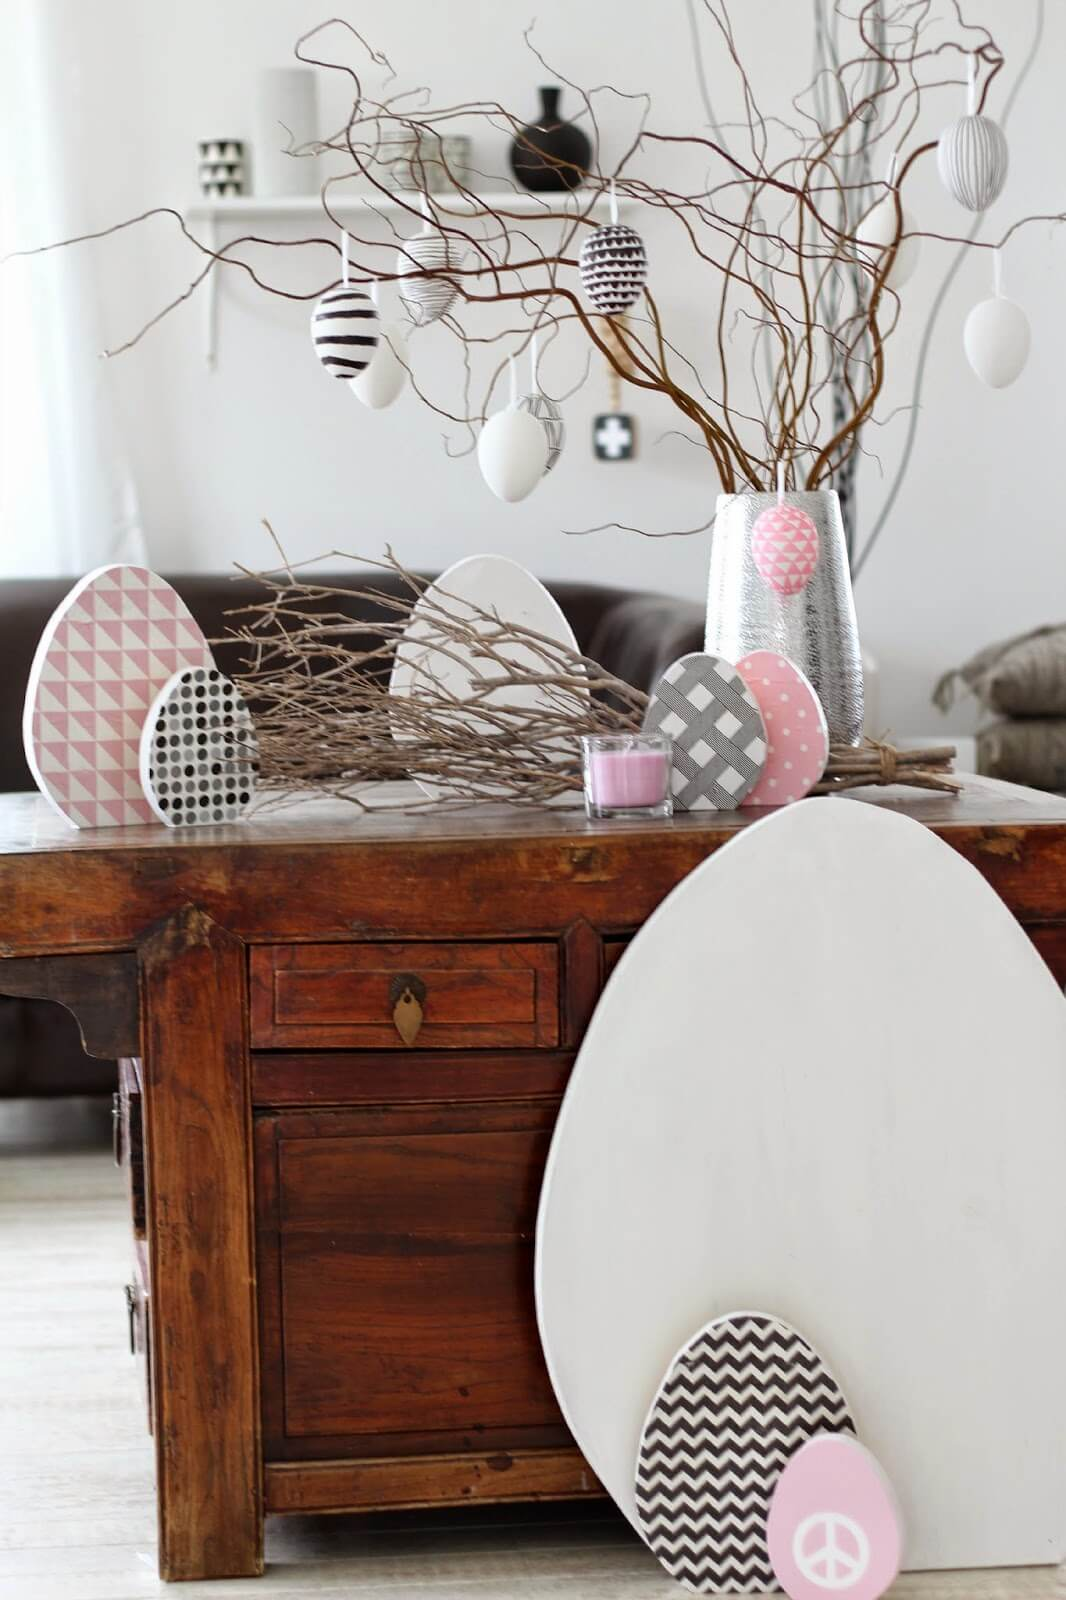 lady-stil-Ostereier-aussaegen-Interiorblog